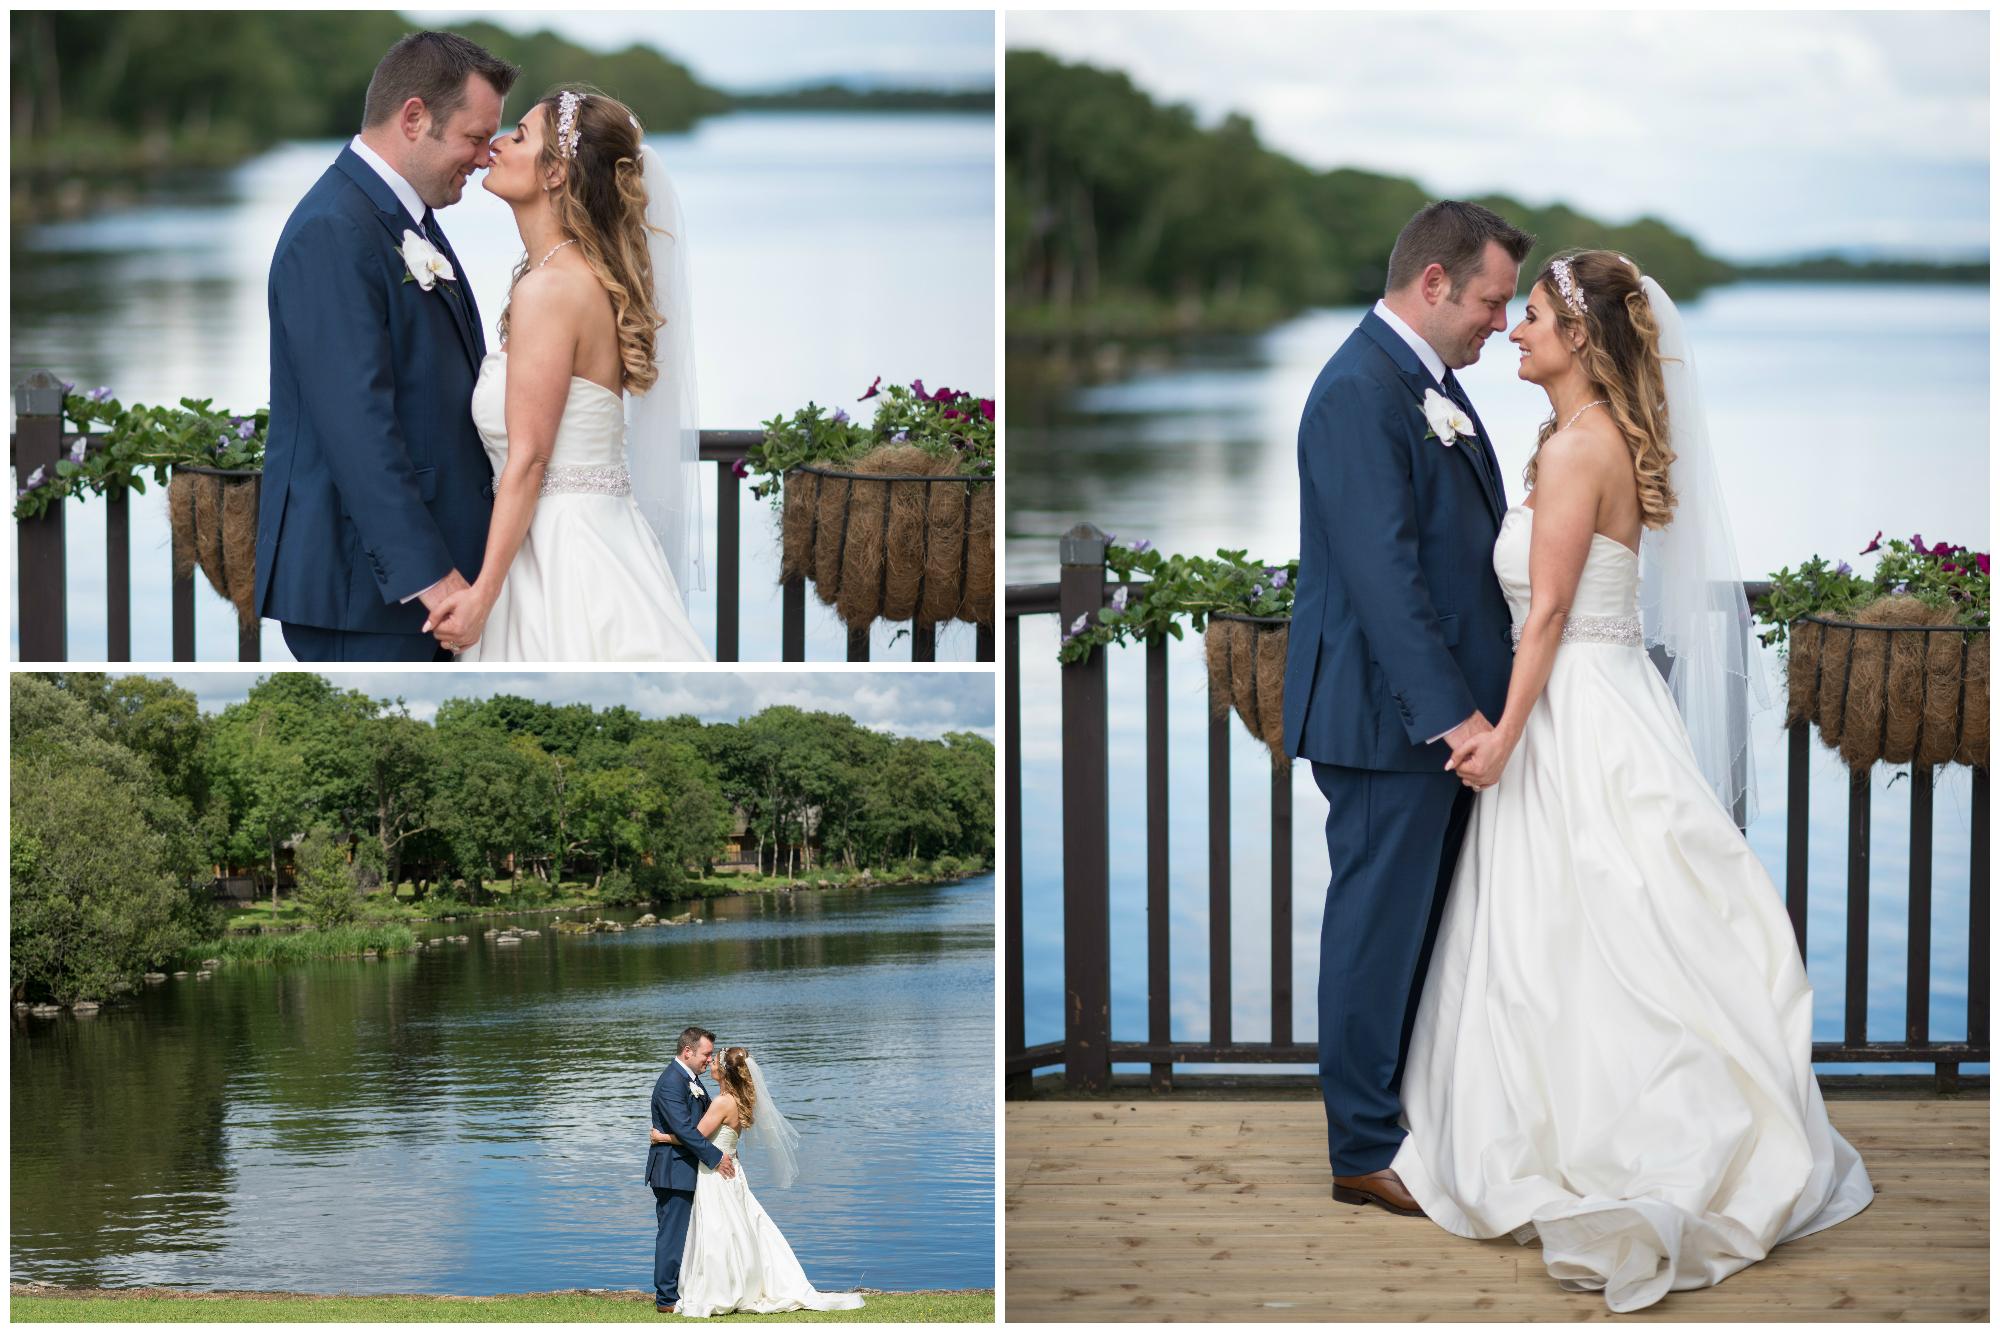 Lusty Beg Island Northern Ireland Wedding Photographers Pure Photo Bride and Groom portraits